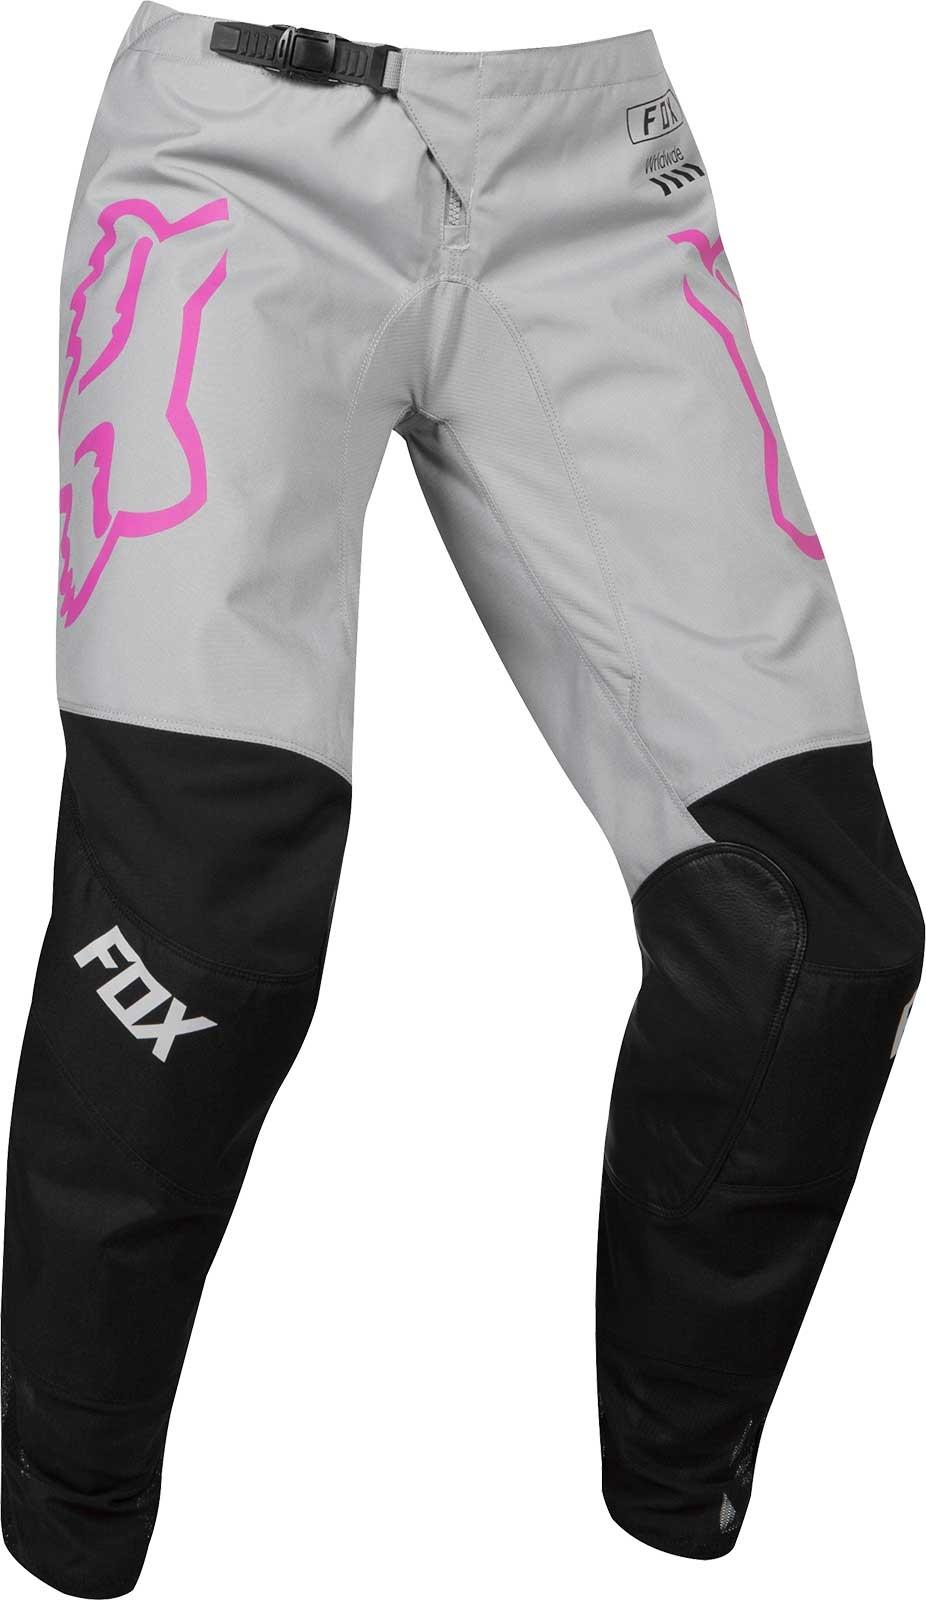 2019 Fox Racing KIDS 180 Pants Boys Girls Motocross Dirt Bike Off Road